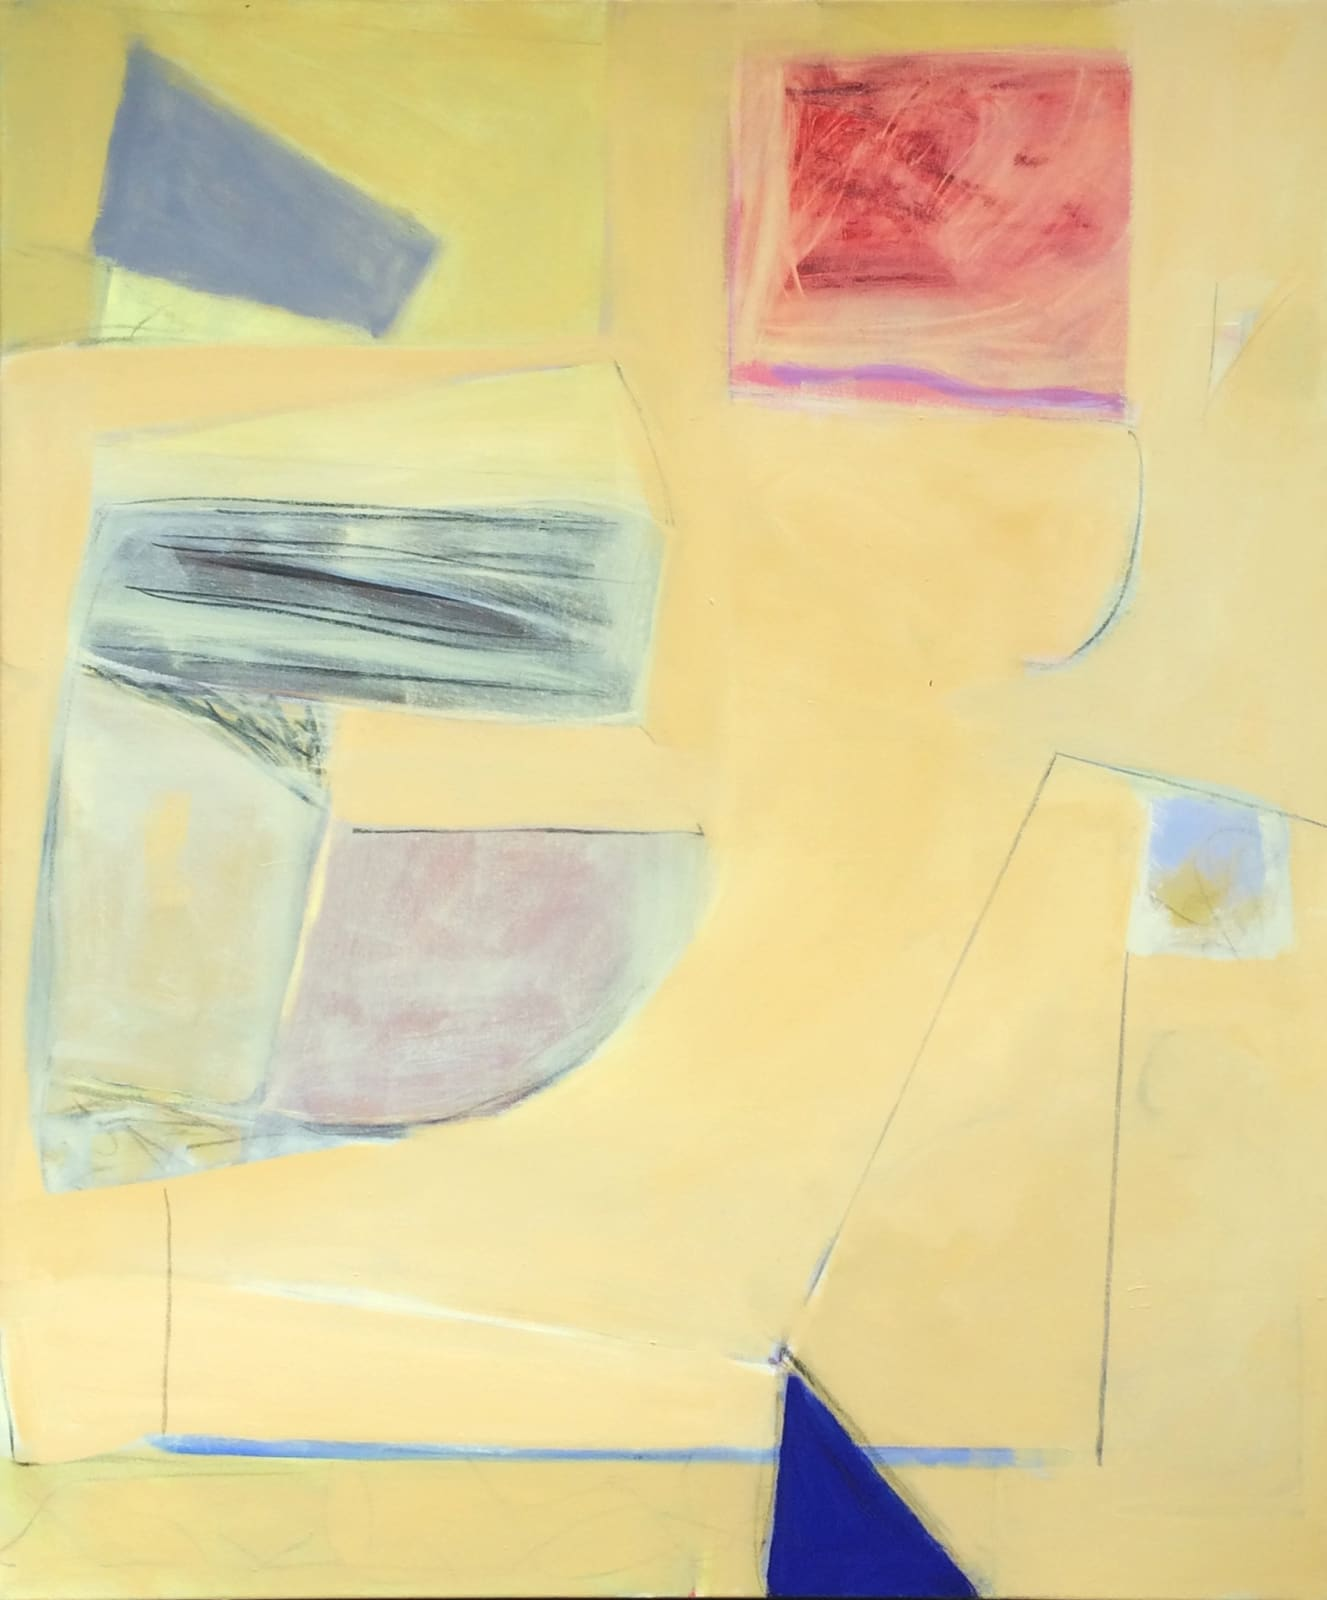 Frank Phelan, Yellow Bird, II 2013